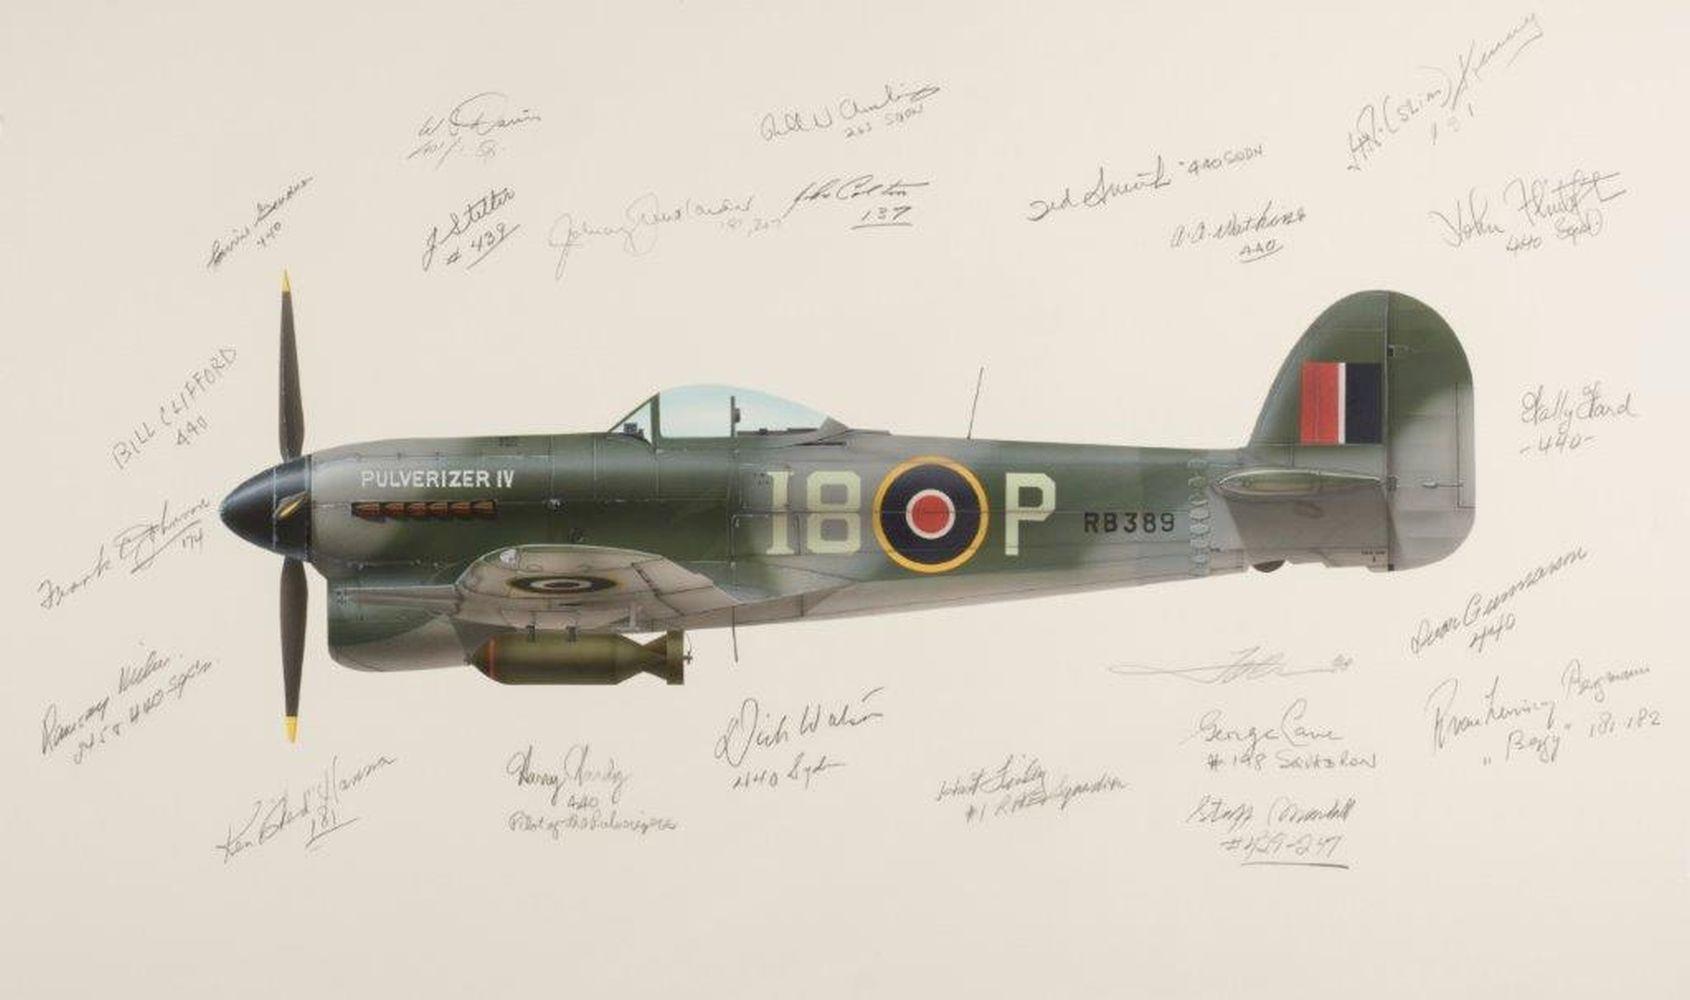 * Valo (John C., circa 1963). Royal Canadian Air Force